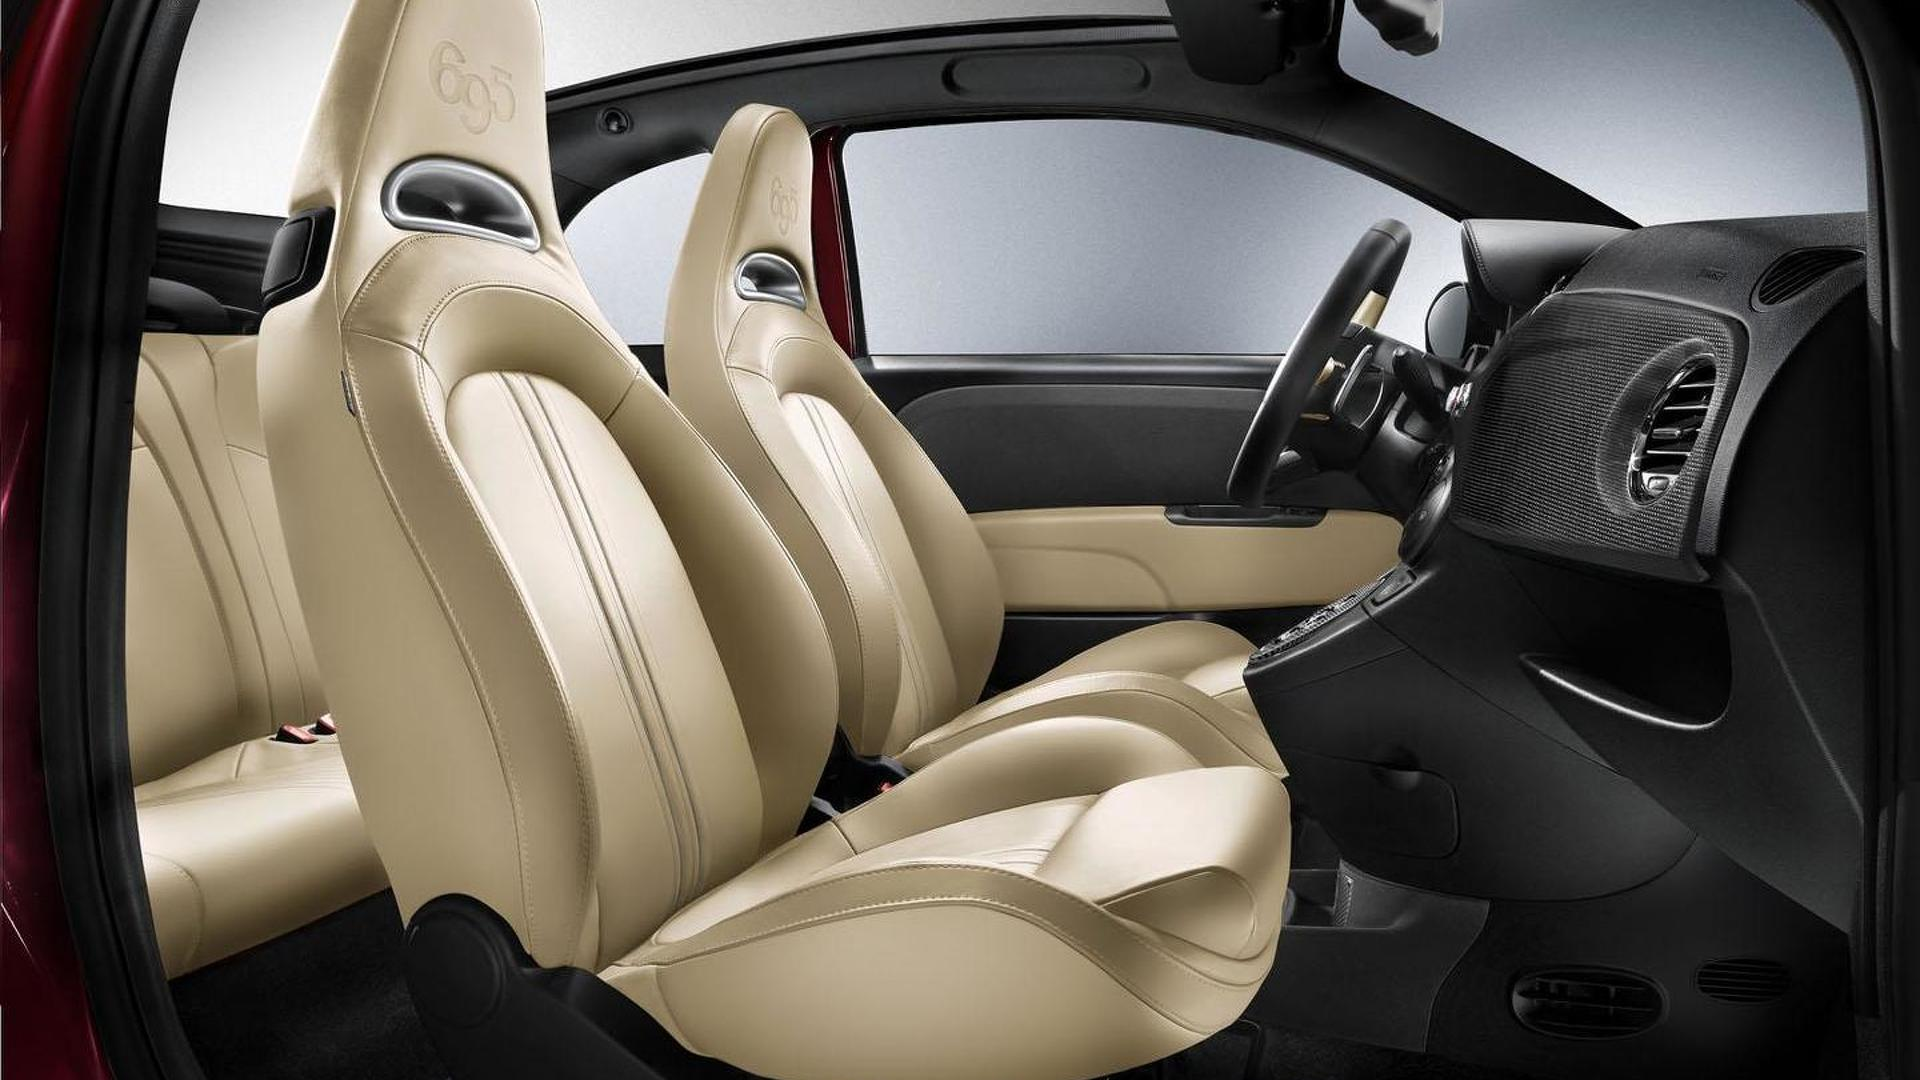 Fiat-Abarth-695-Maserati-Edition-07